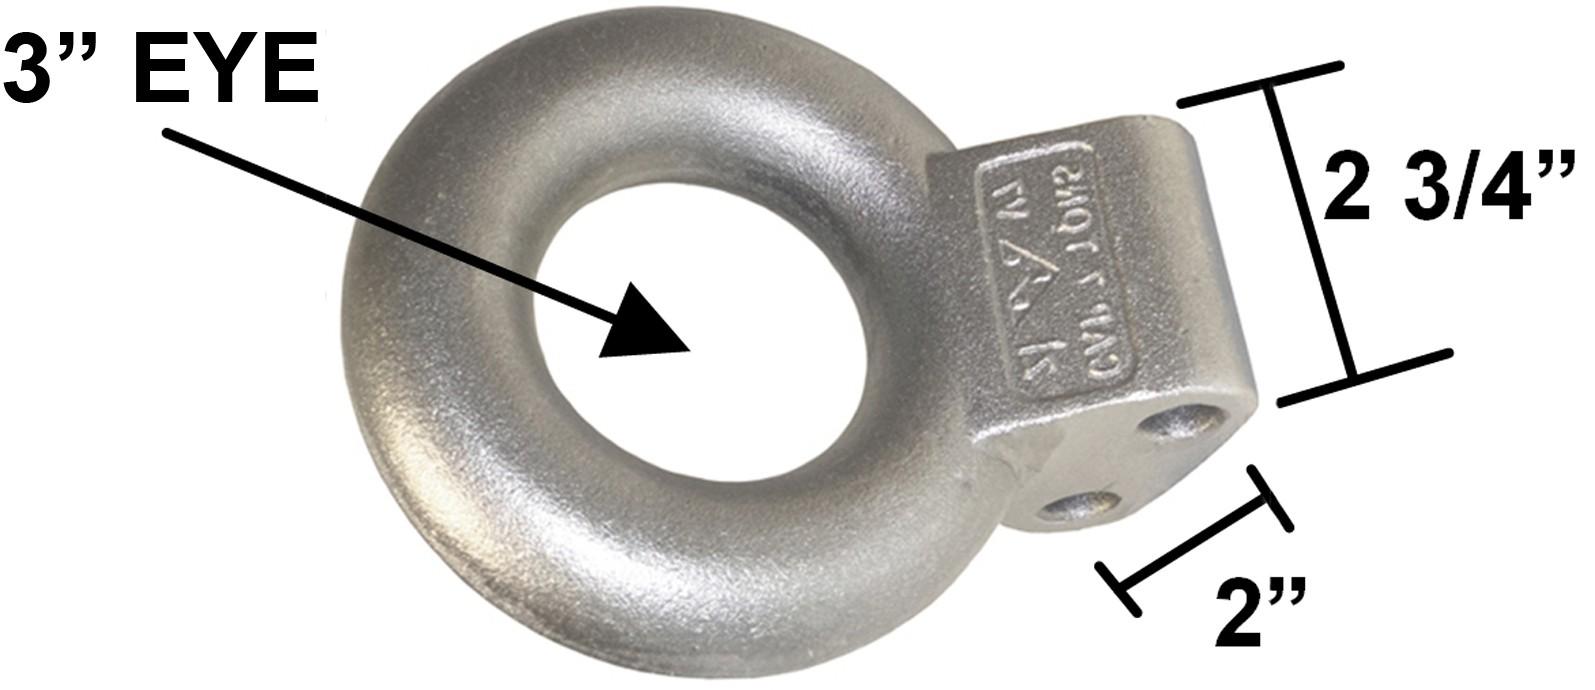 "Lunette Eye for Adjustable Channel - 3"" I.D. - 20,000 lbs."